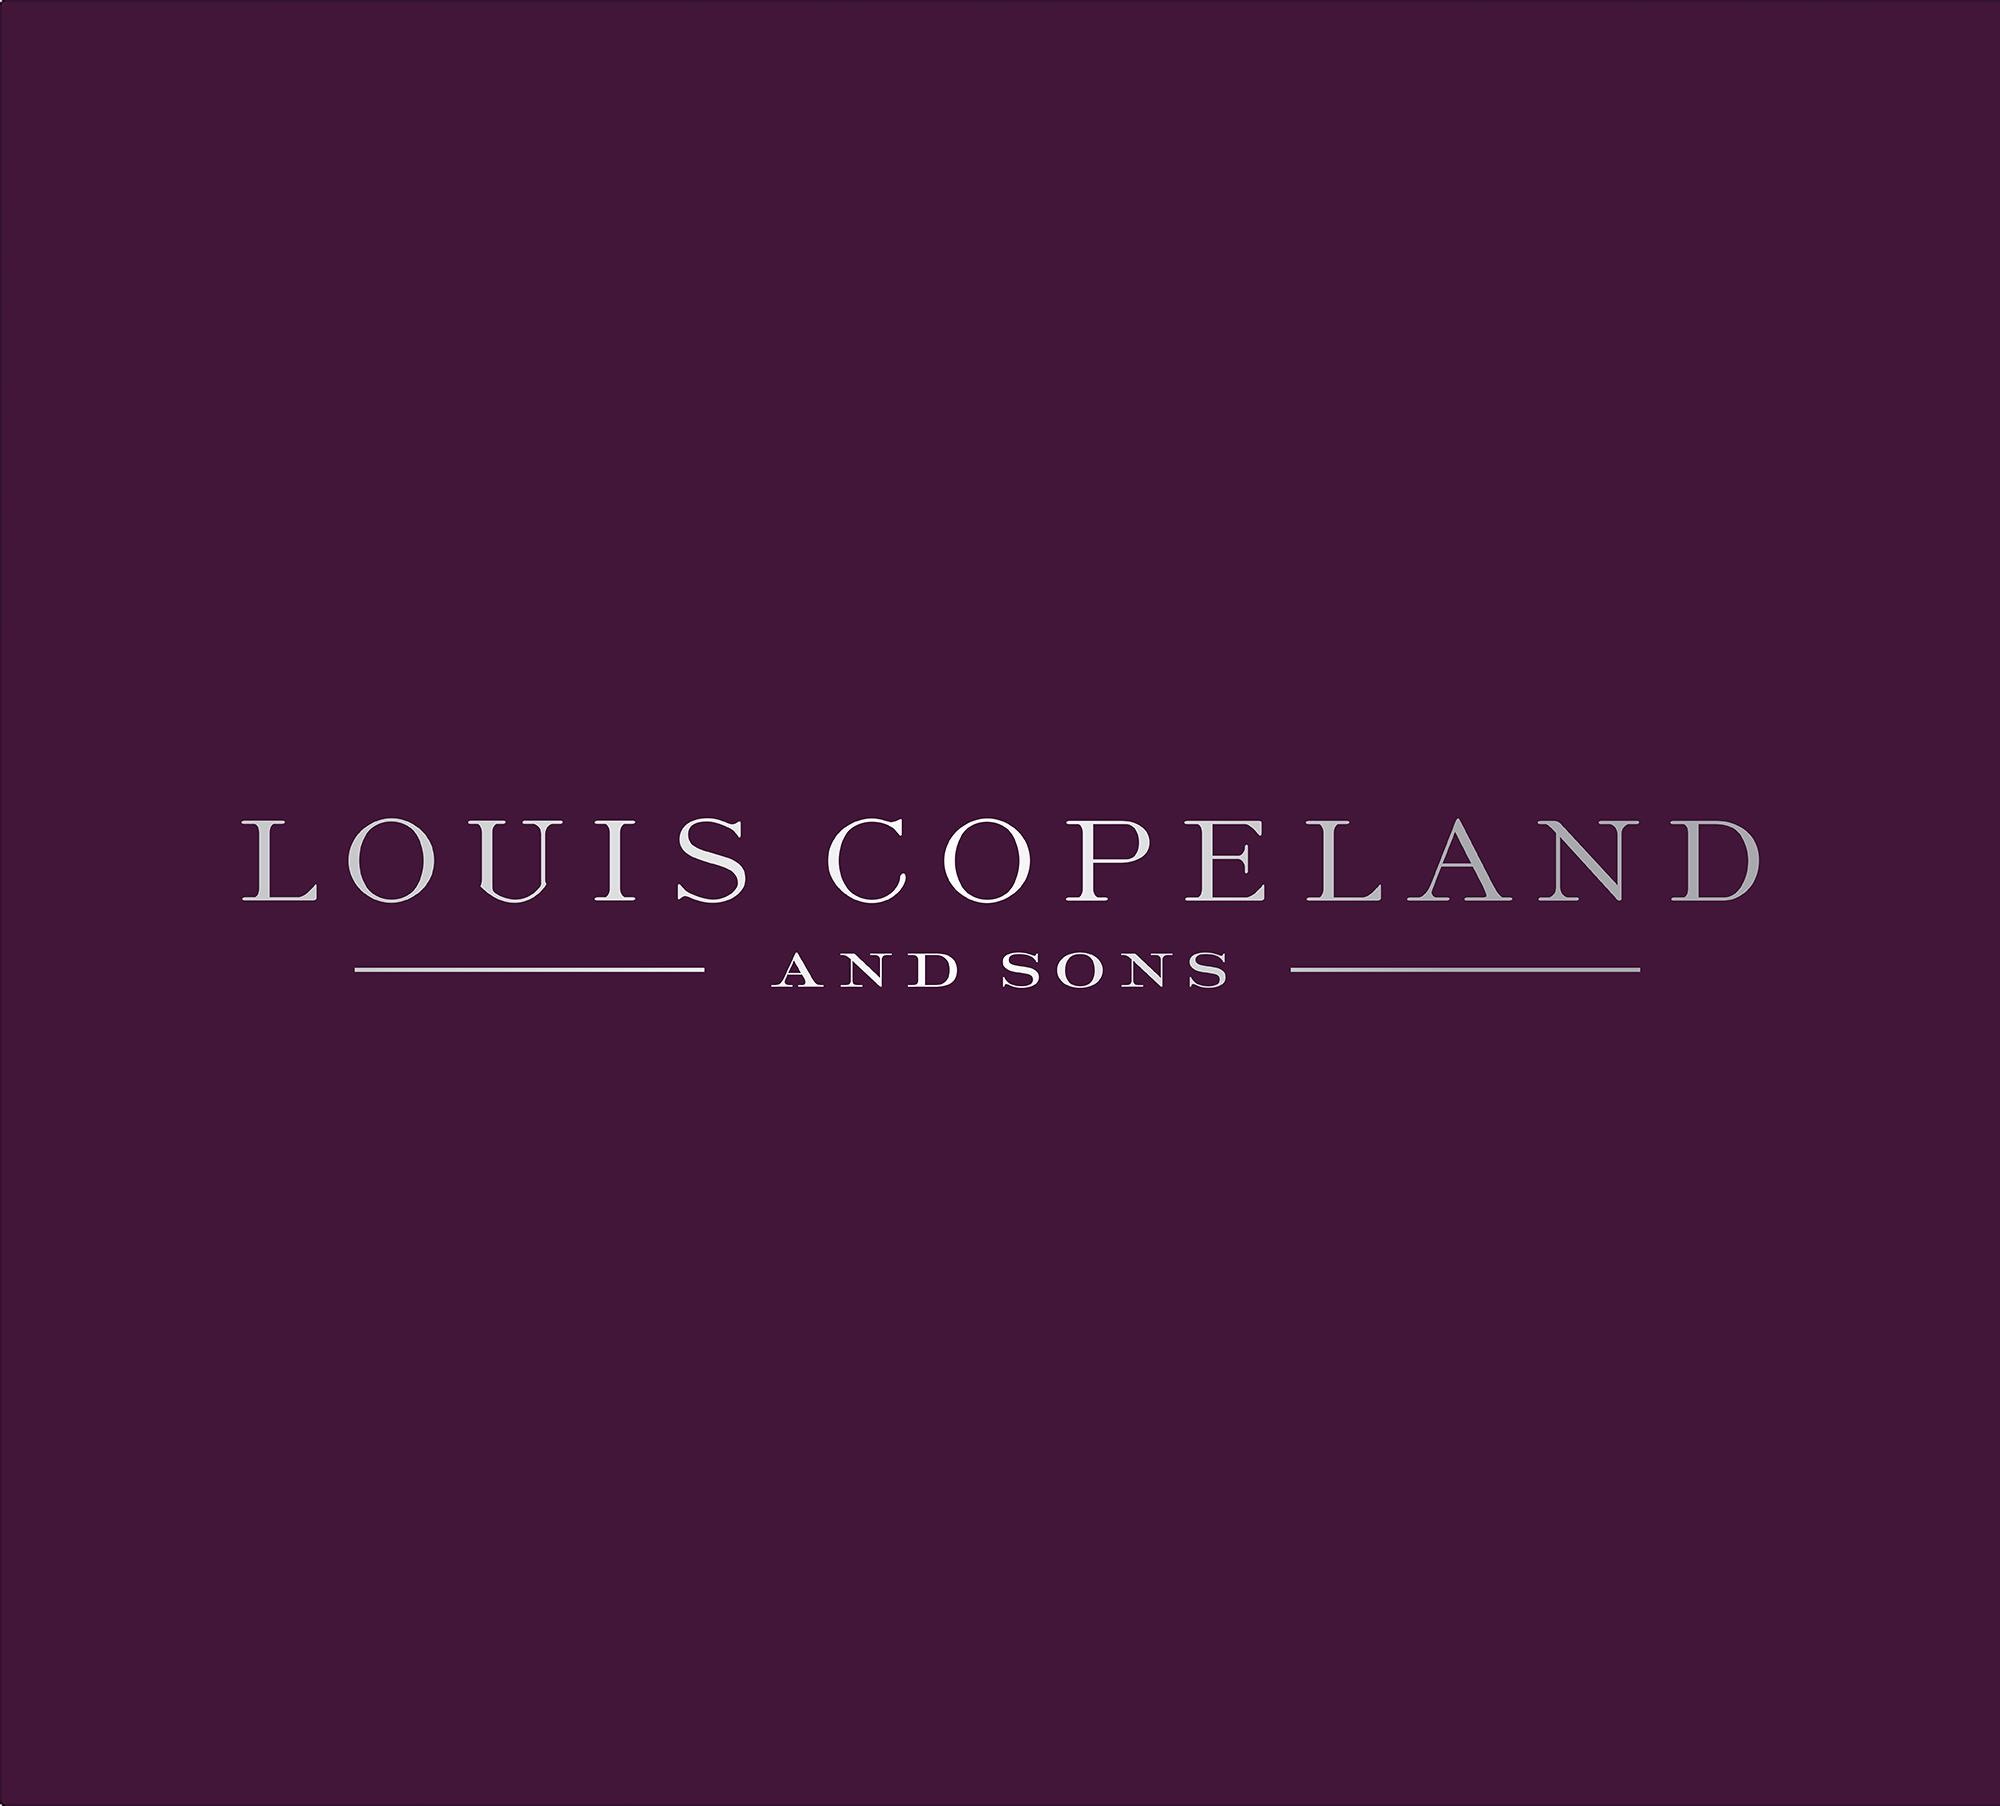 Cover image: Louis Copeland